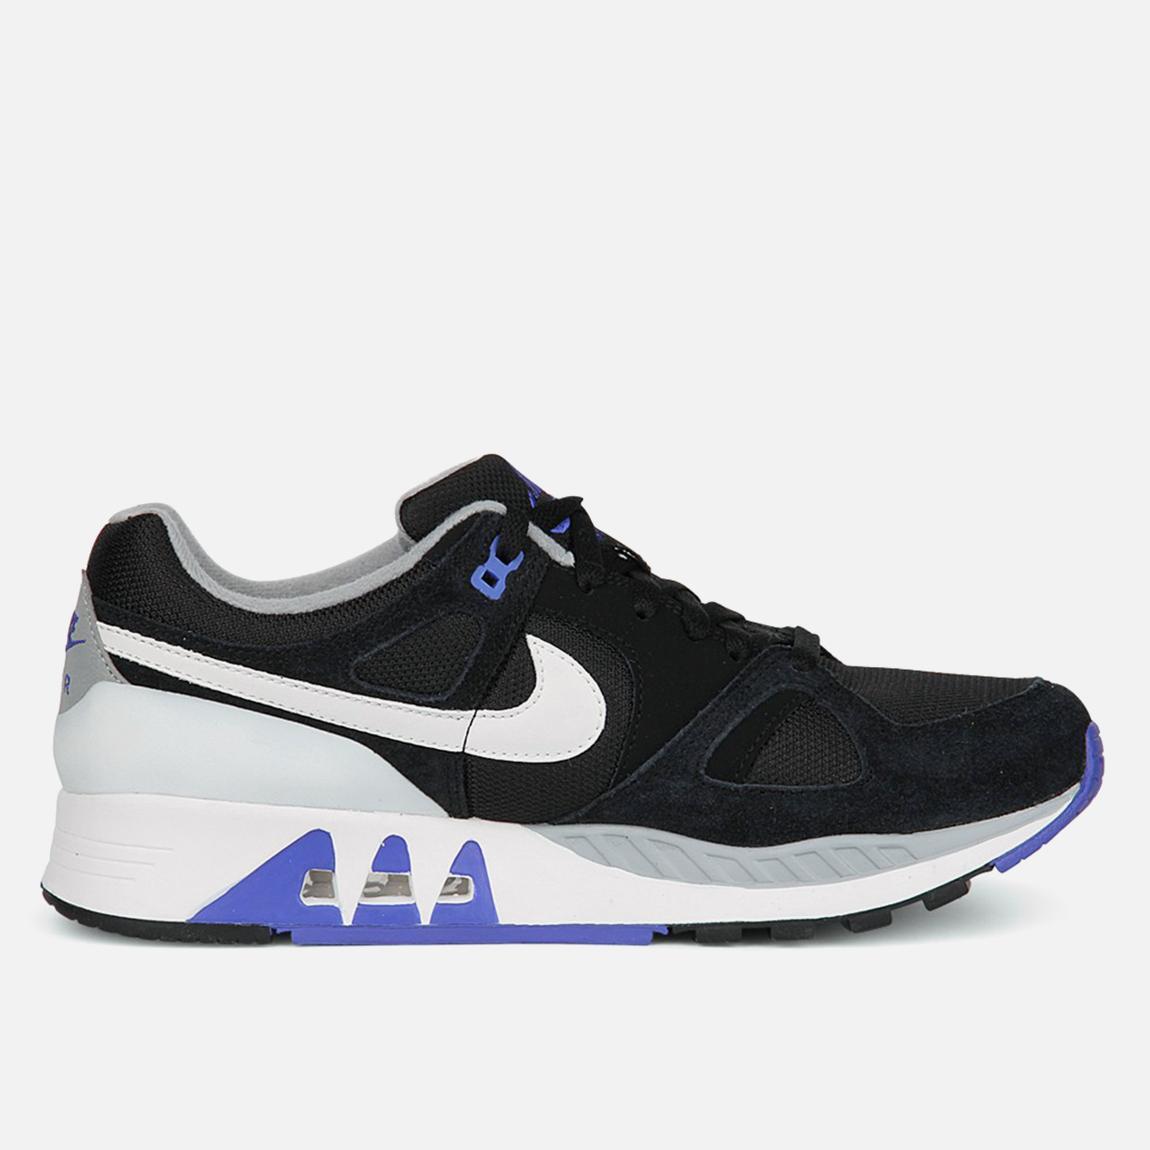 Air Stab - 312451-005 - Black   White   Persian Violet Nike Sneakers ... 49c732db51